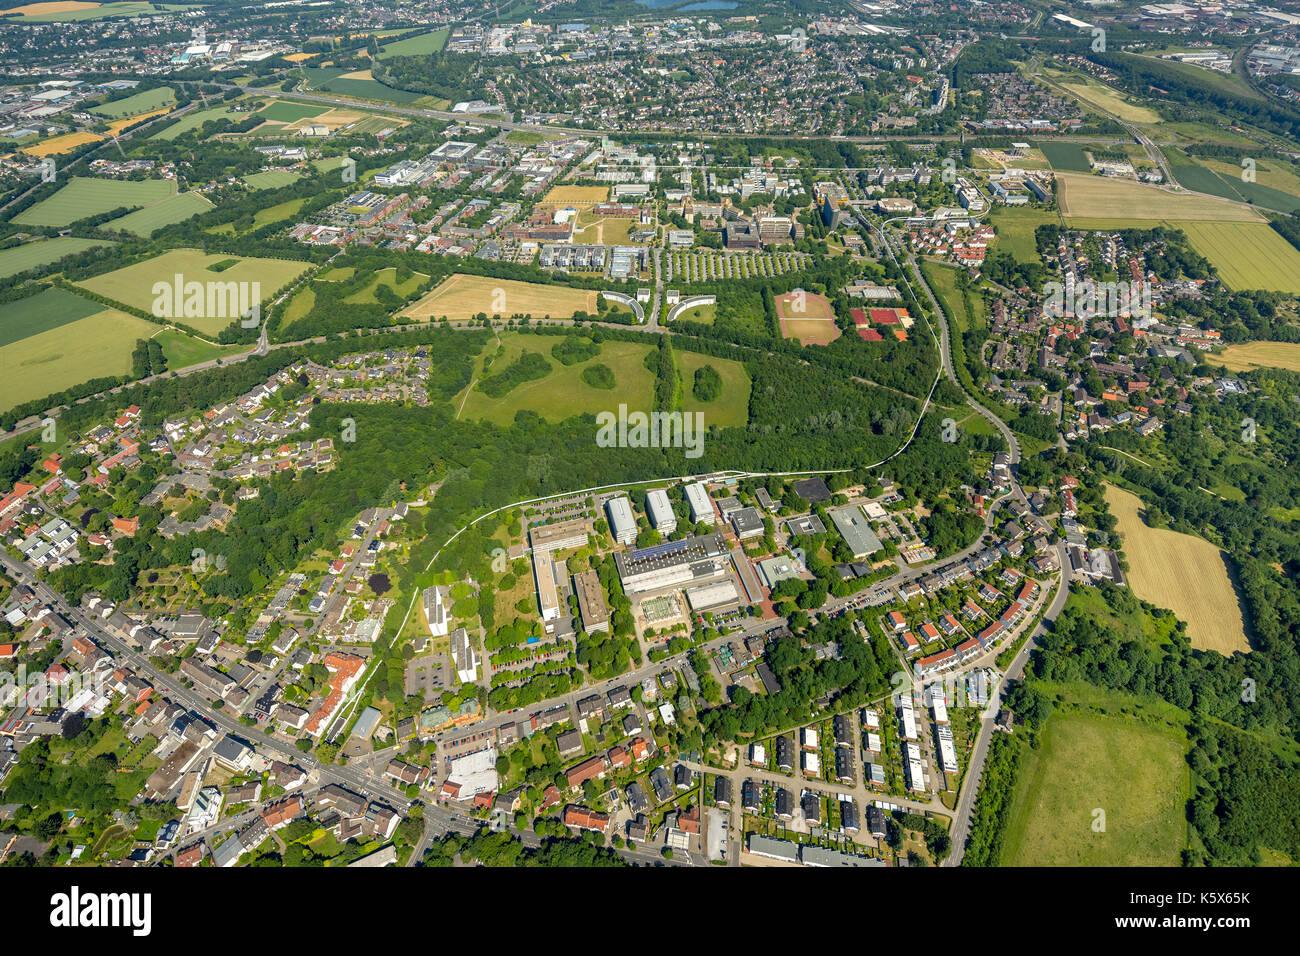 TechnologyParkDortmund on the campus of the University of Dortmund, Dortmund, Ruhr area, North Rhine-Westphalia, Germany Dortmund, Europe, aerial phot - Stock Image